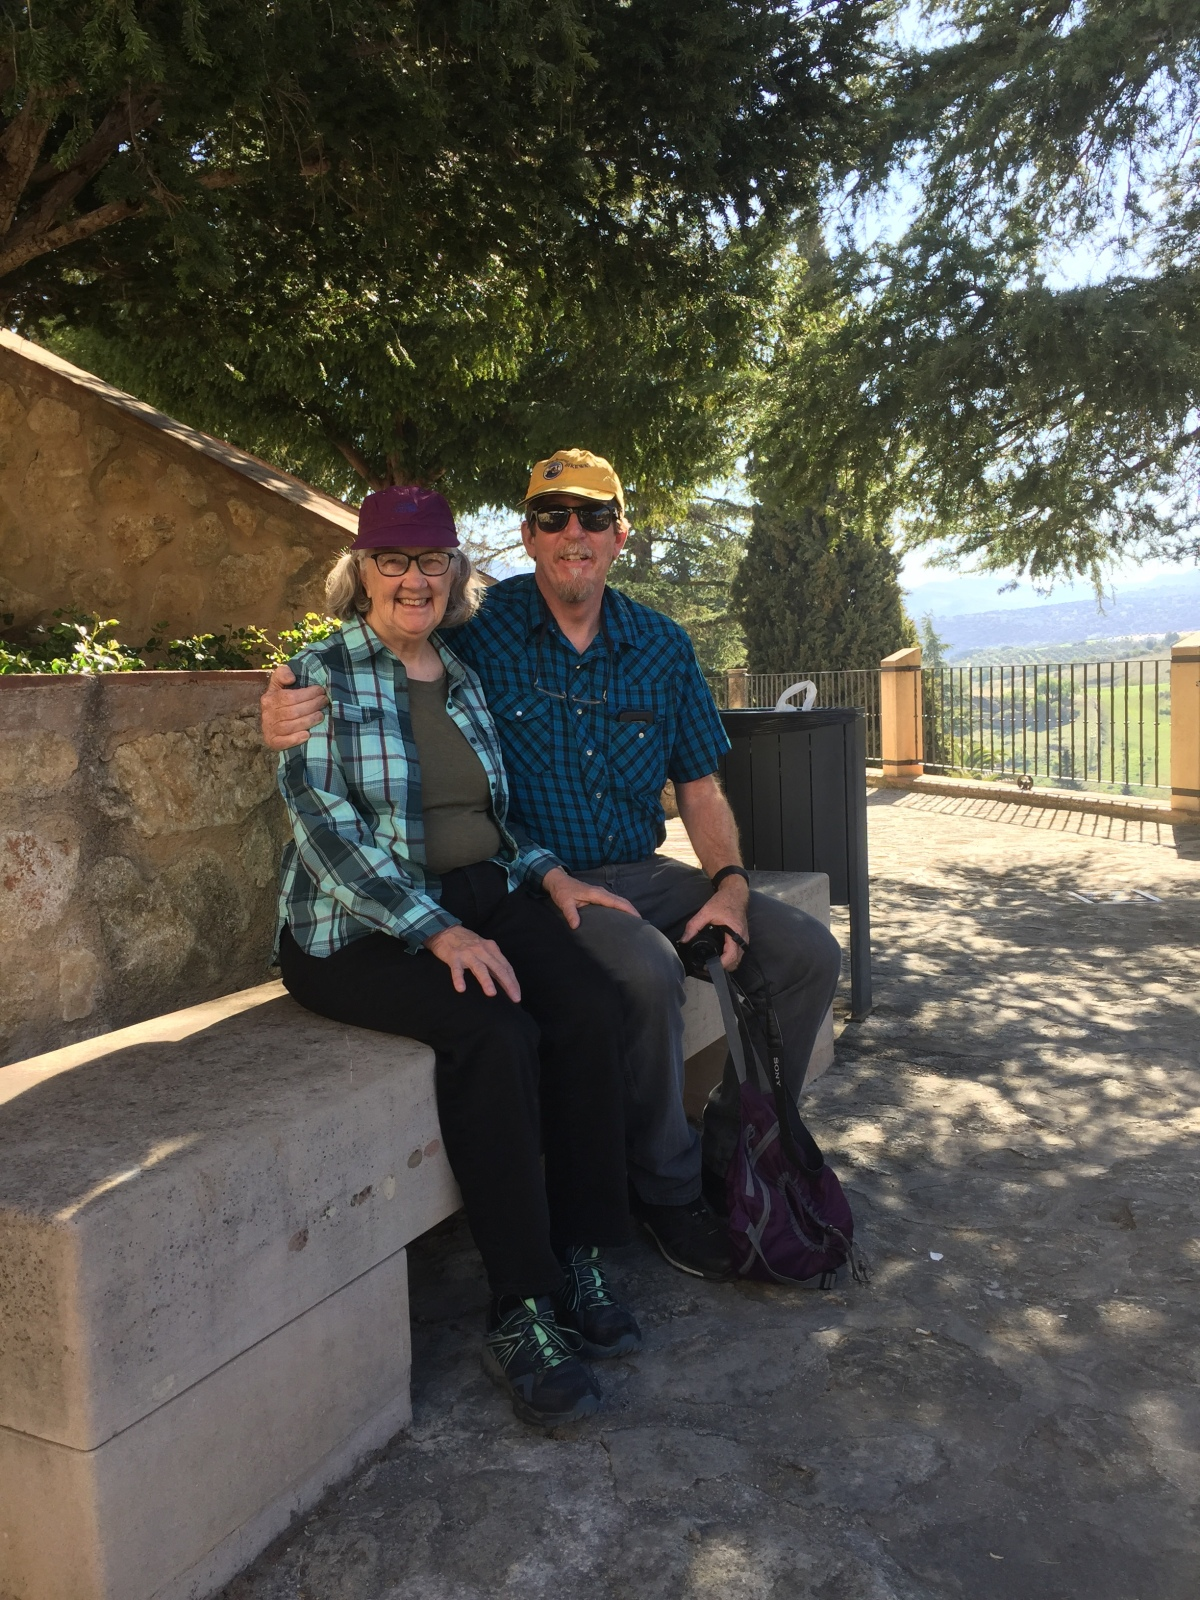 Ronda to Arcos de laFrontera